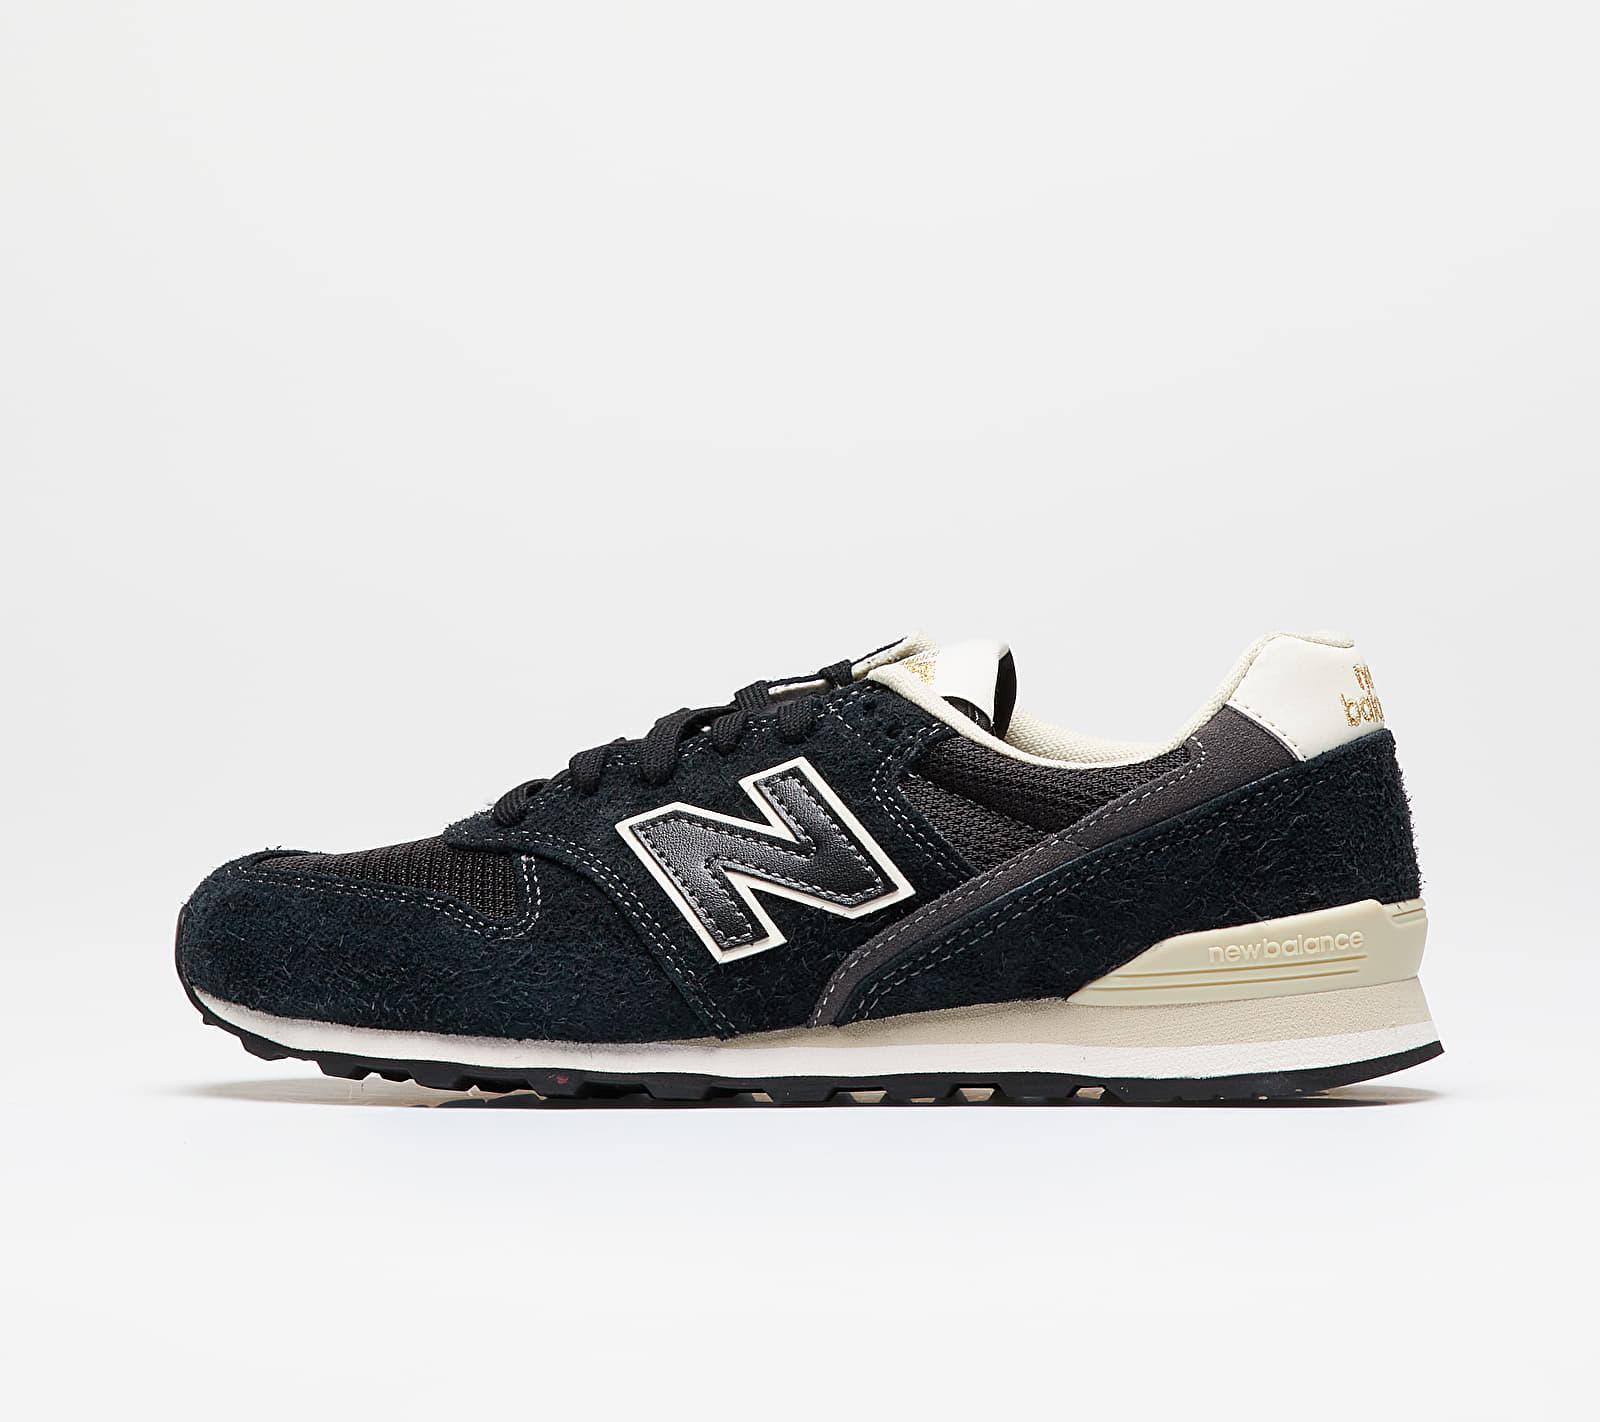 New Balance 996 Navy/ Black EUR 37.5